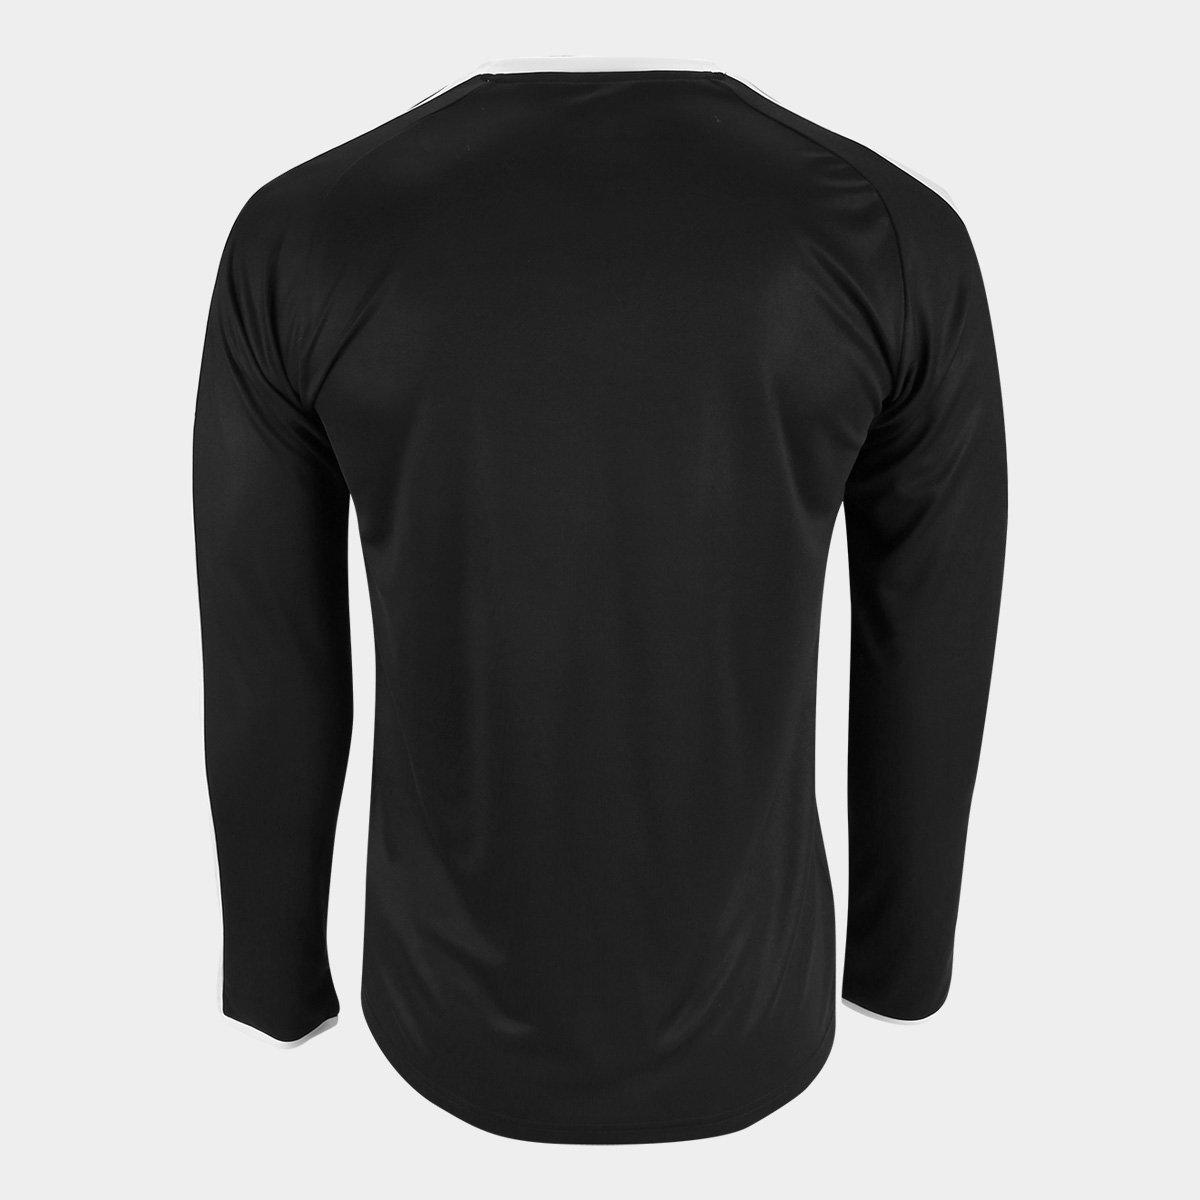 Camiseta Puma Liga Jersey Manga Longa Masculina - Preto e Branco ... 59a825d43056b